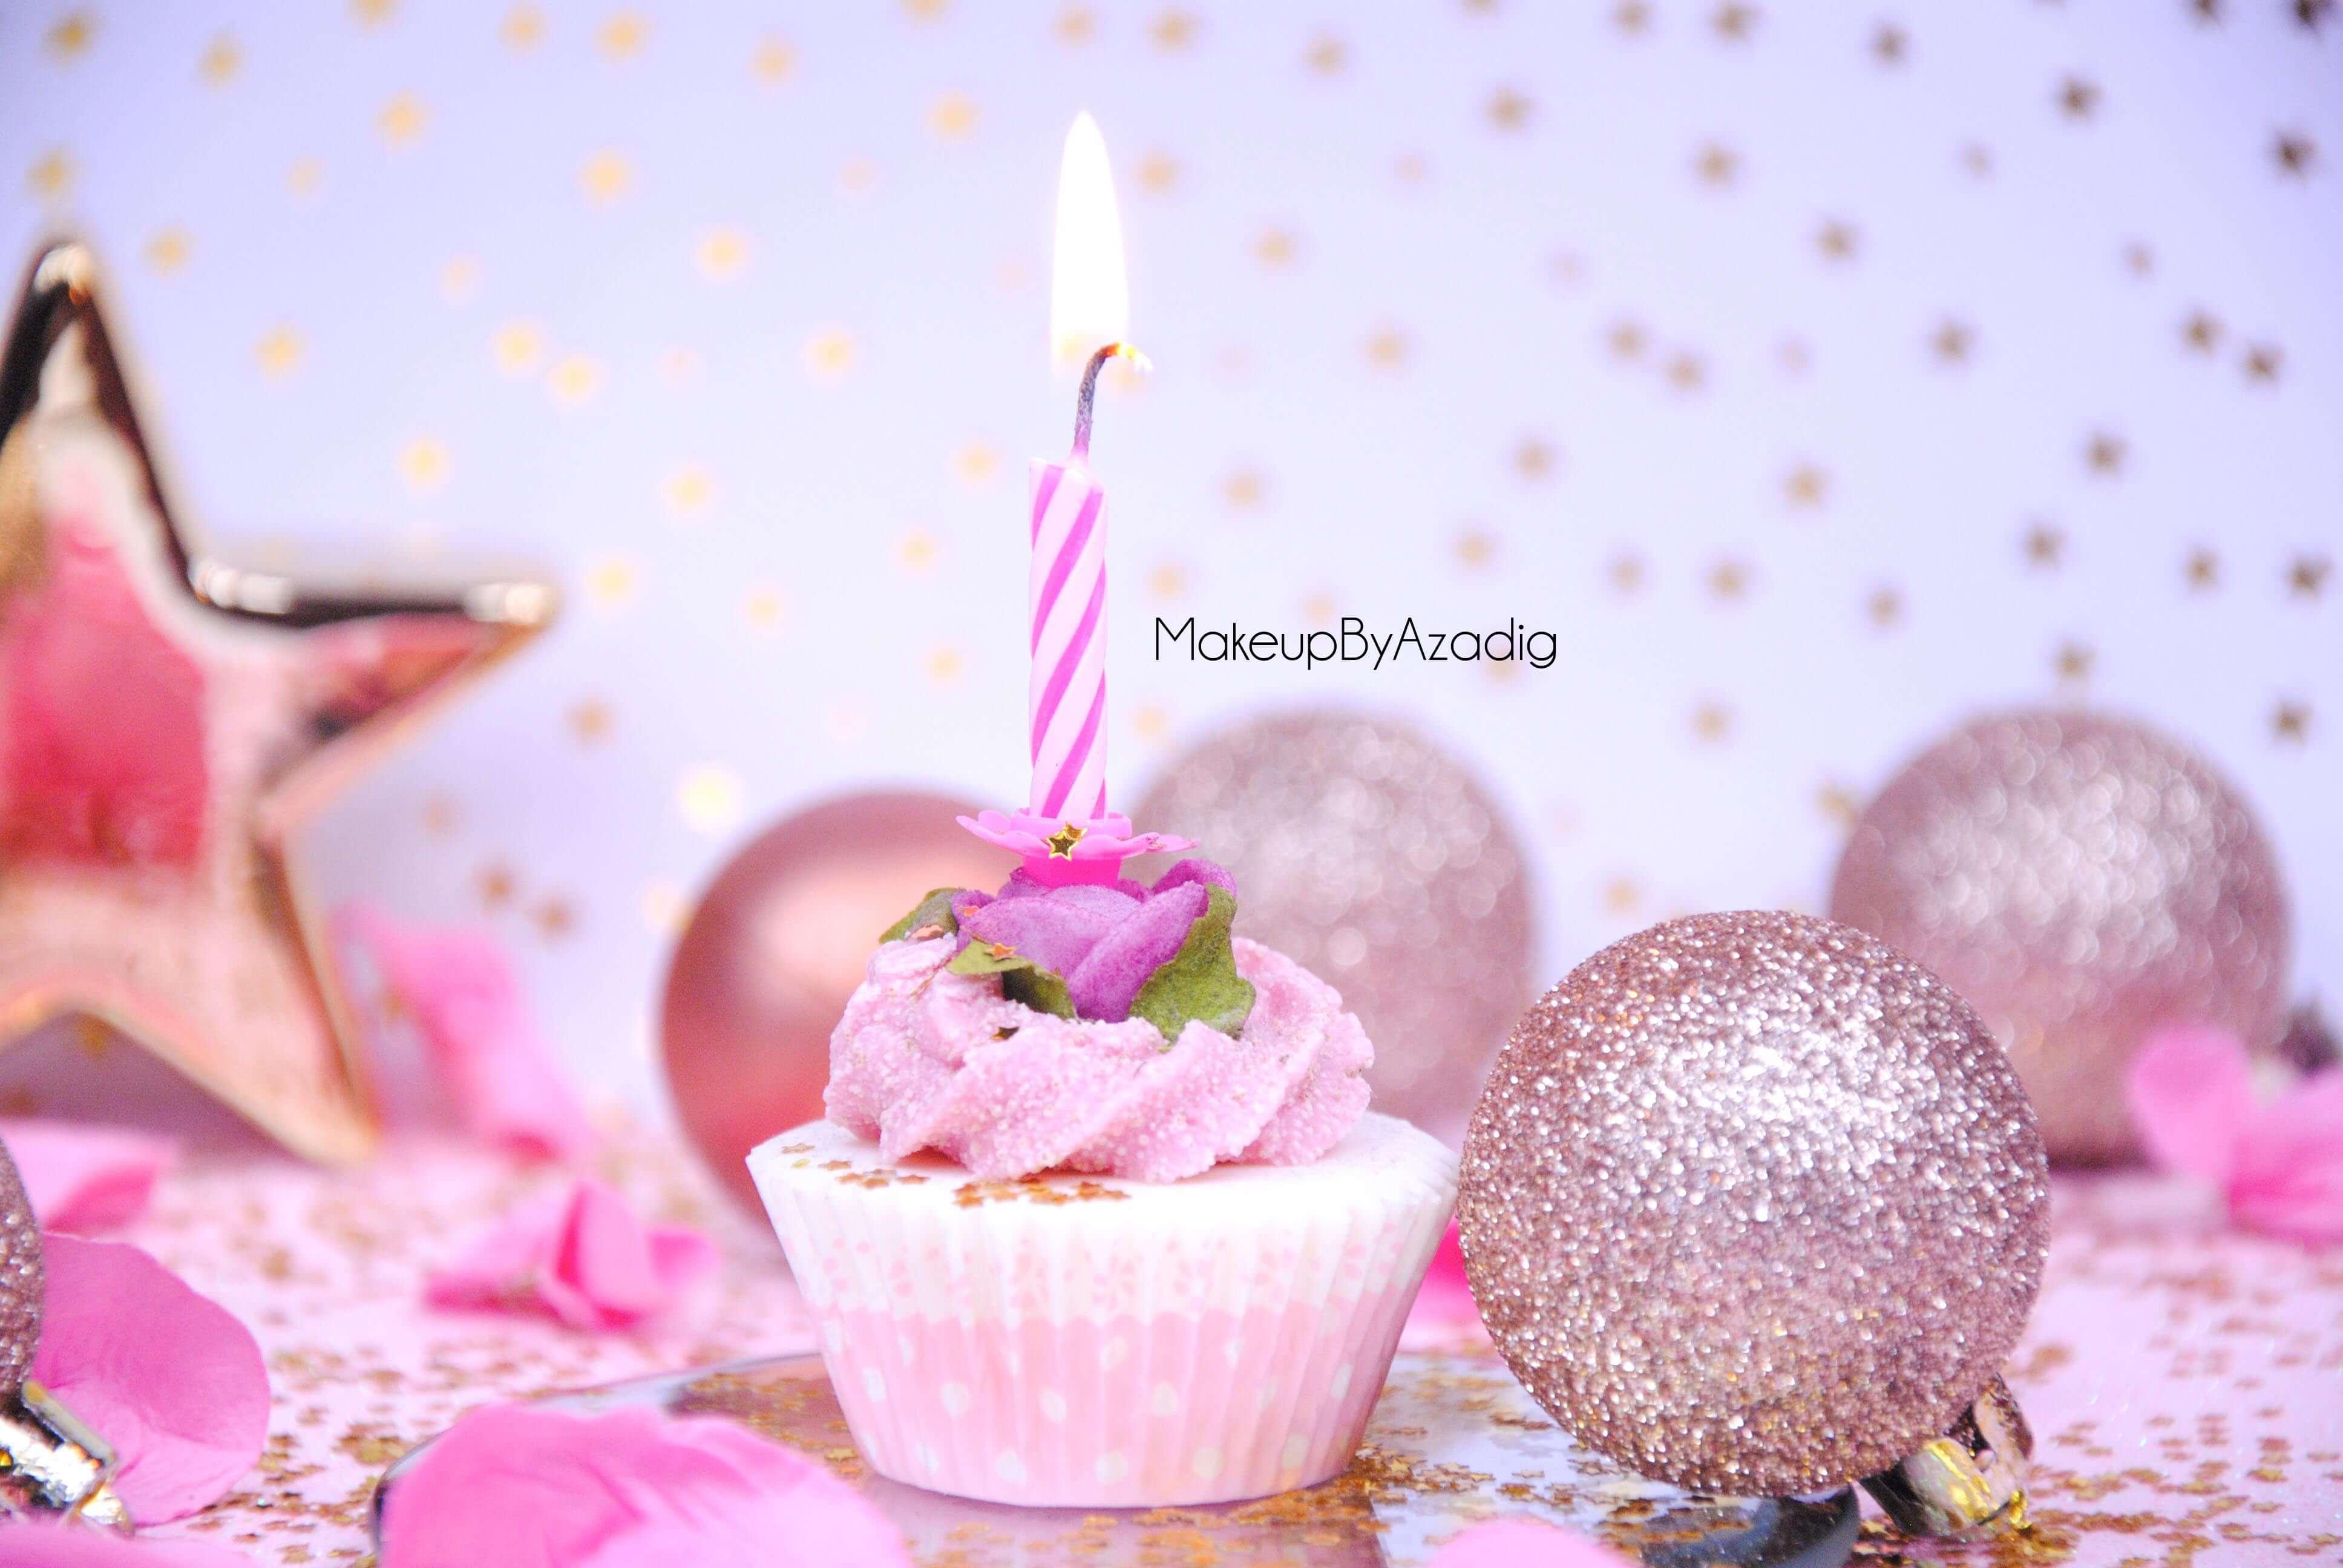 bougie-makeupbyazadig-joyeux-blog-anniversaire-influencer-troyes-paris-love